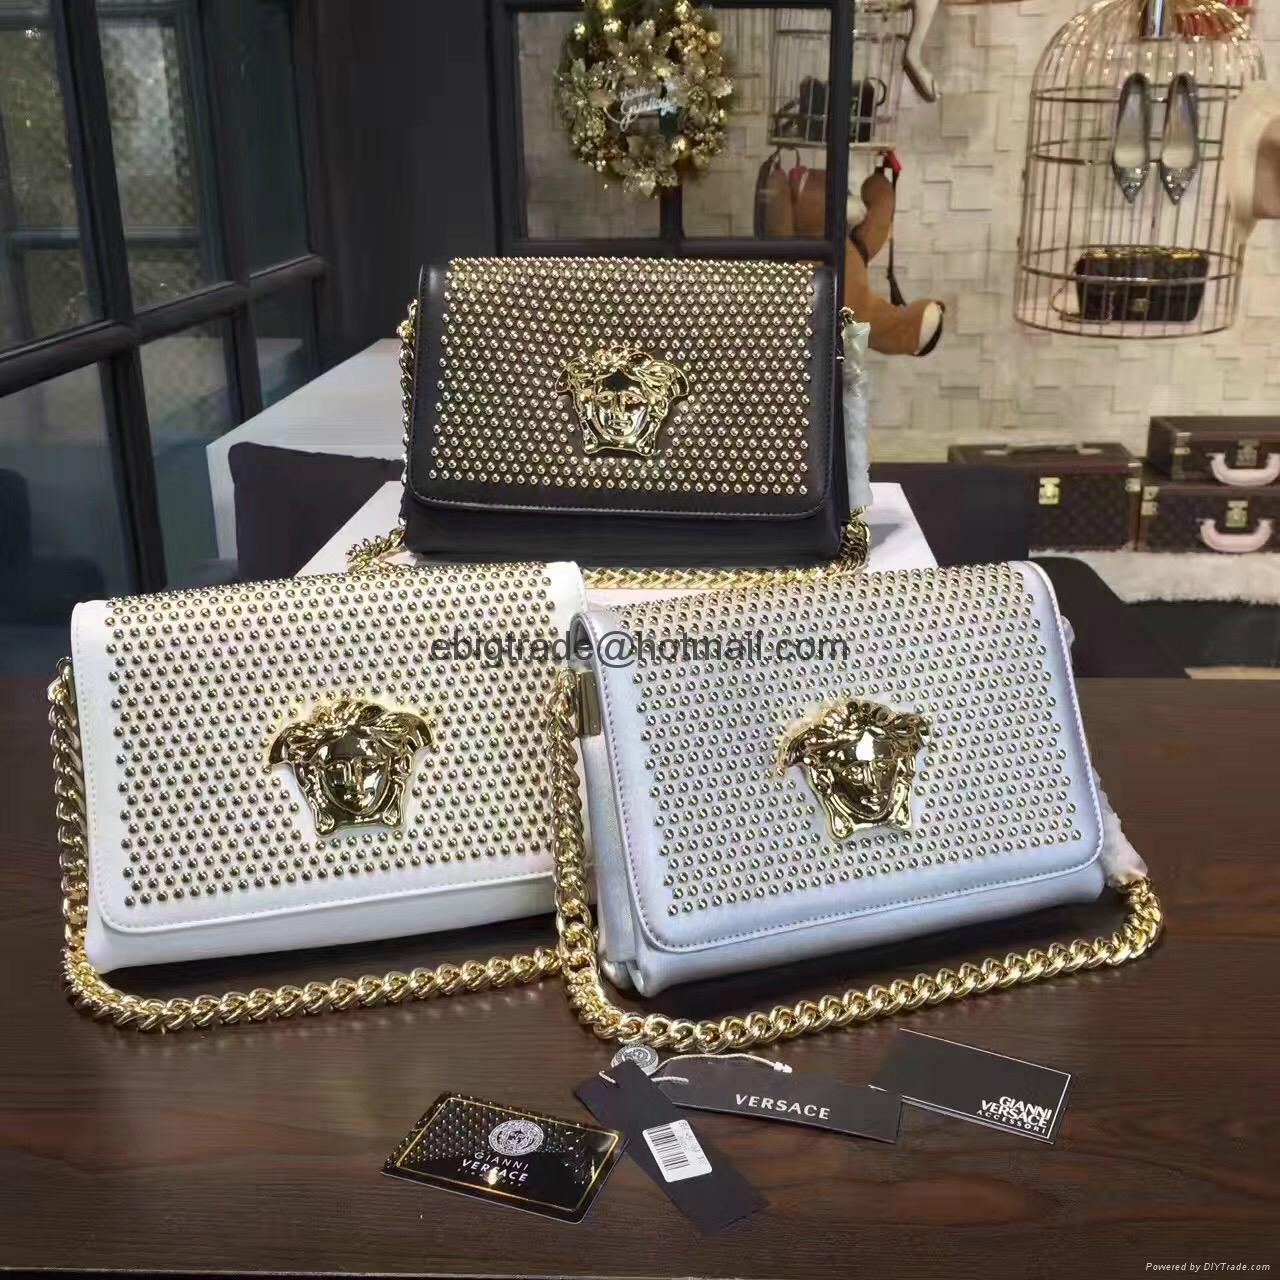 f7babb730dcc Versace Bags Purse Handbags Replica For Men. Versace Palazzo Empire ...